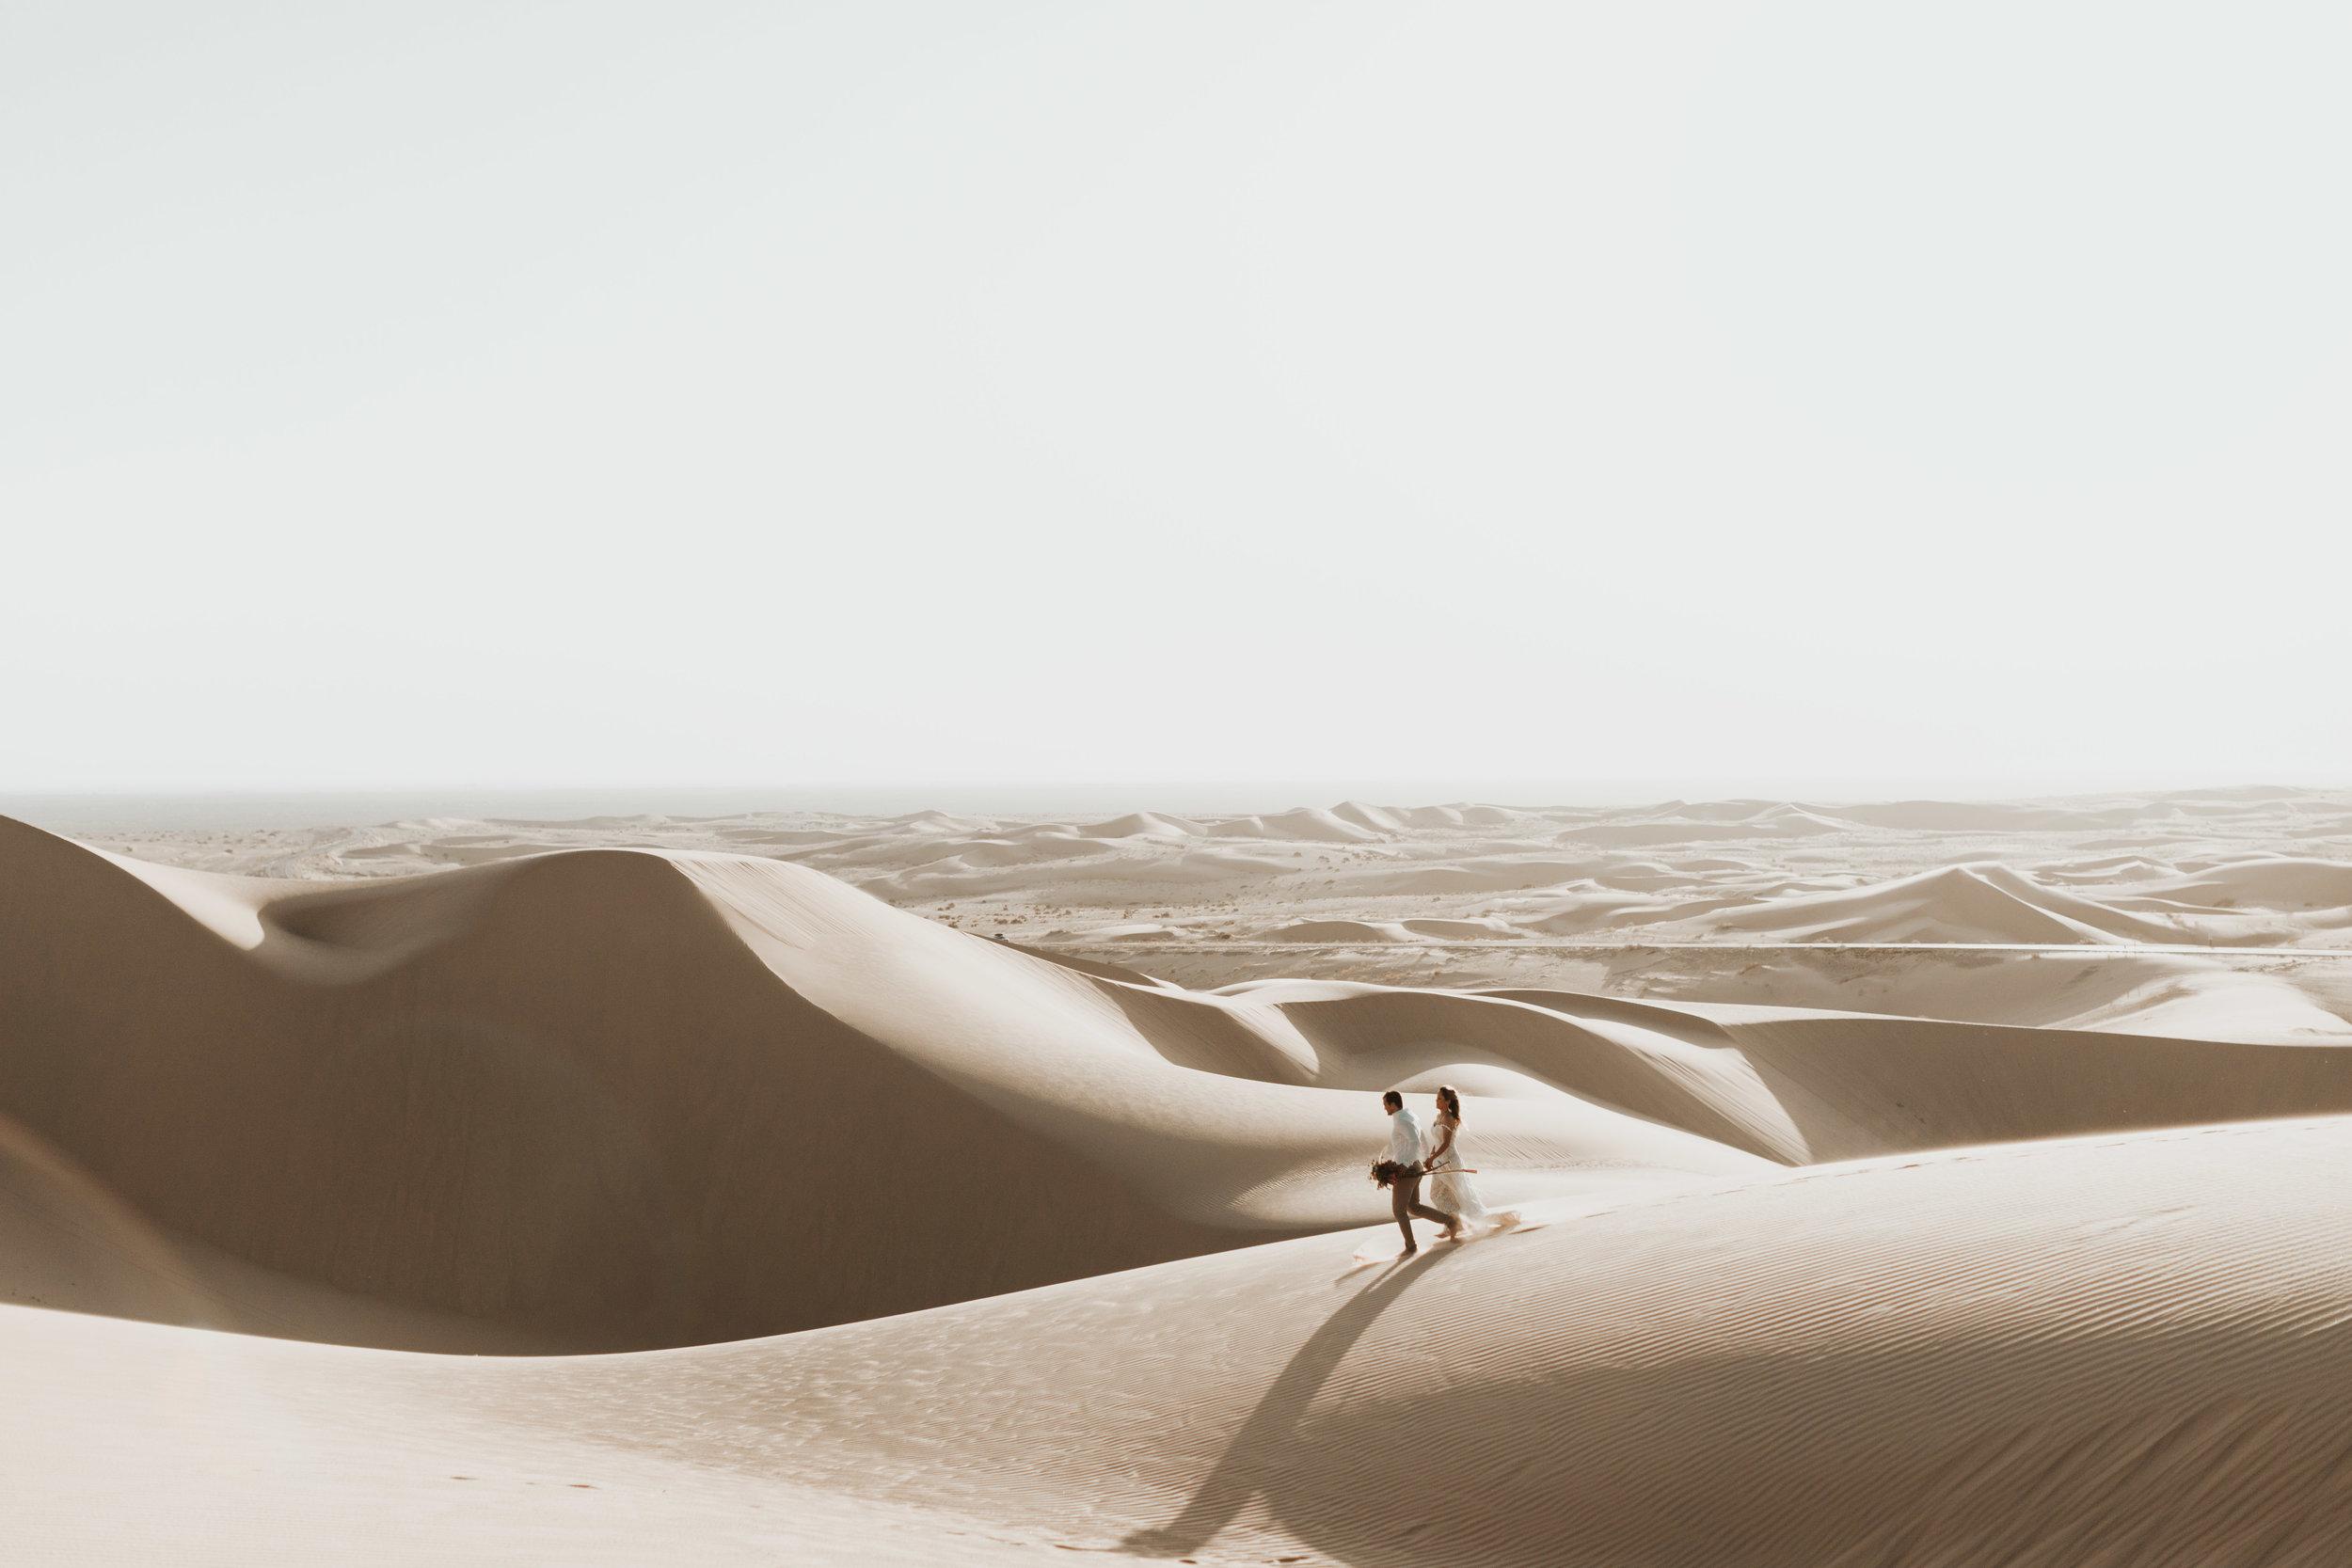 imperial sand dunes destination styled elopement wedding